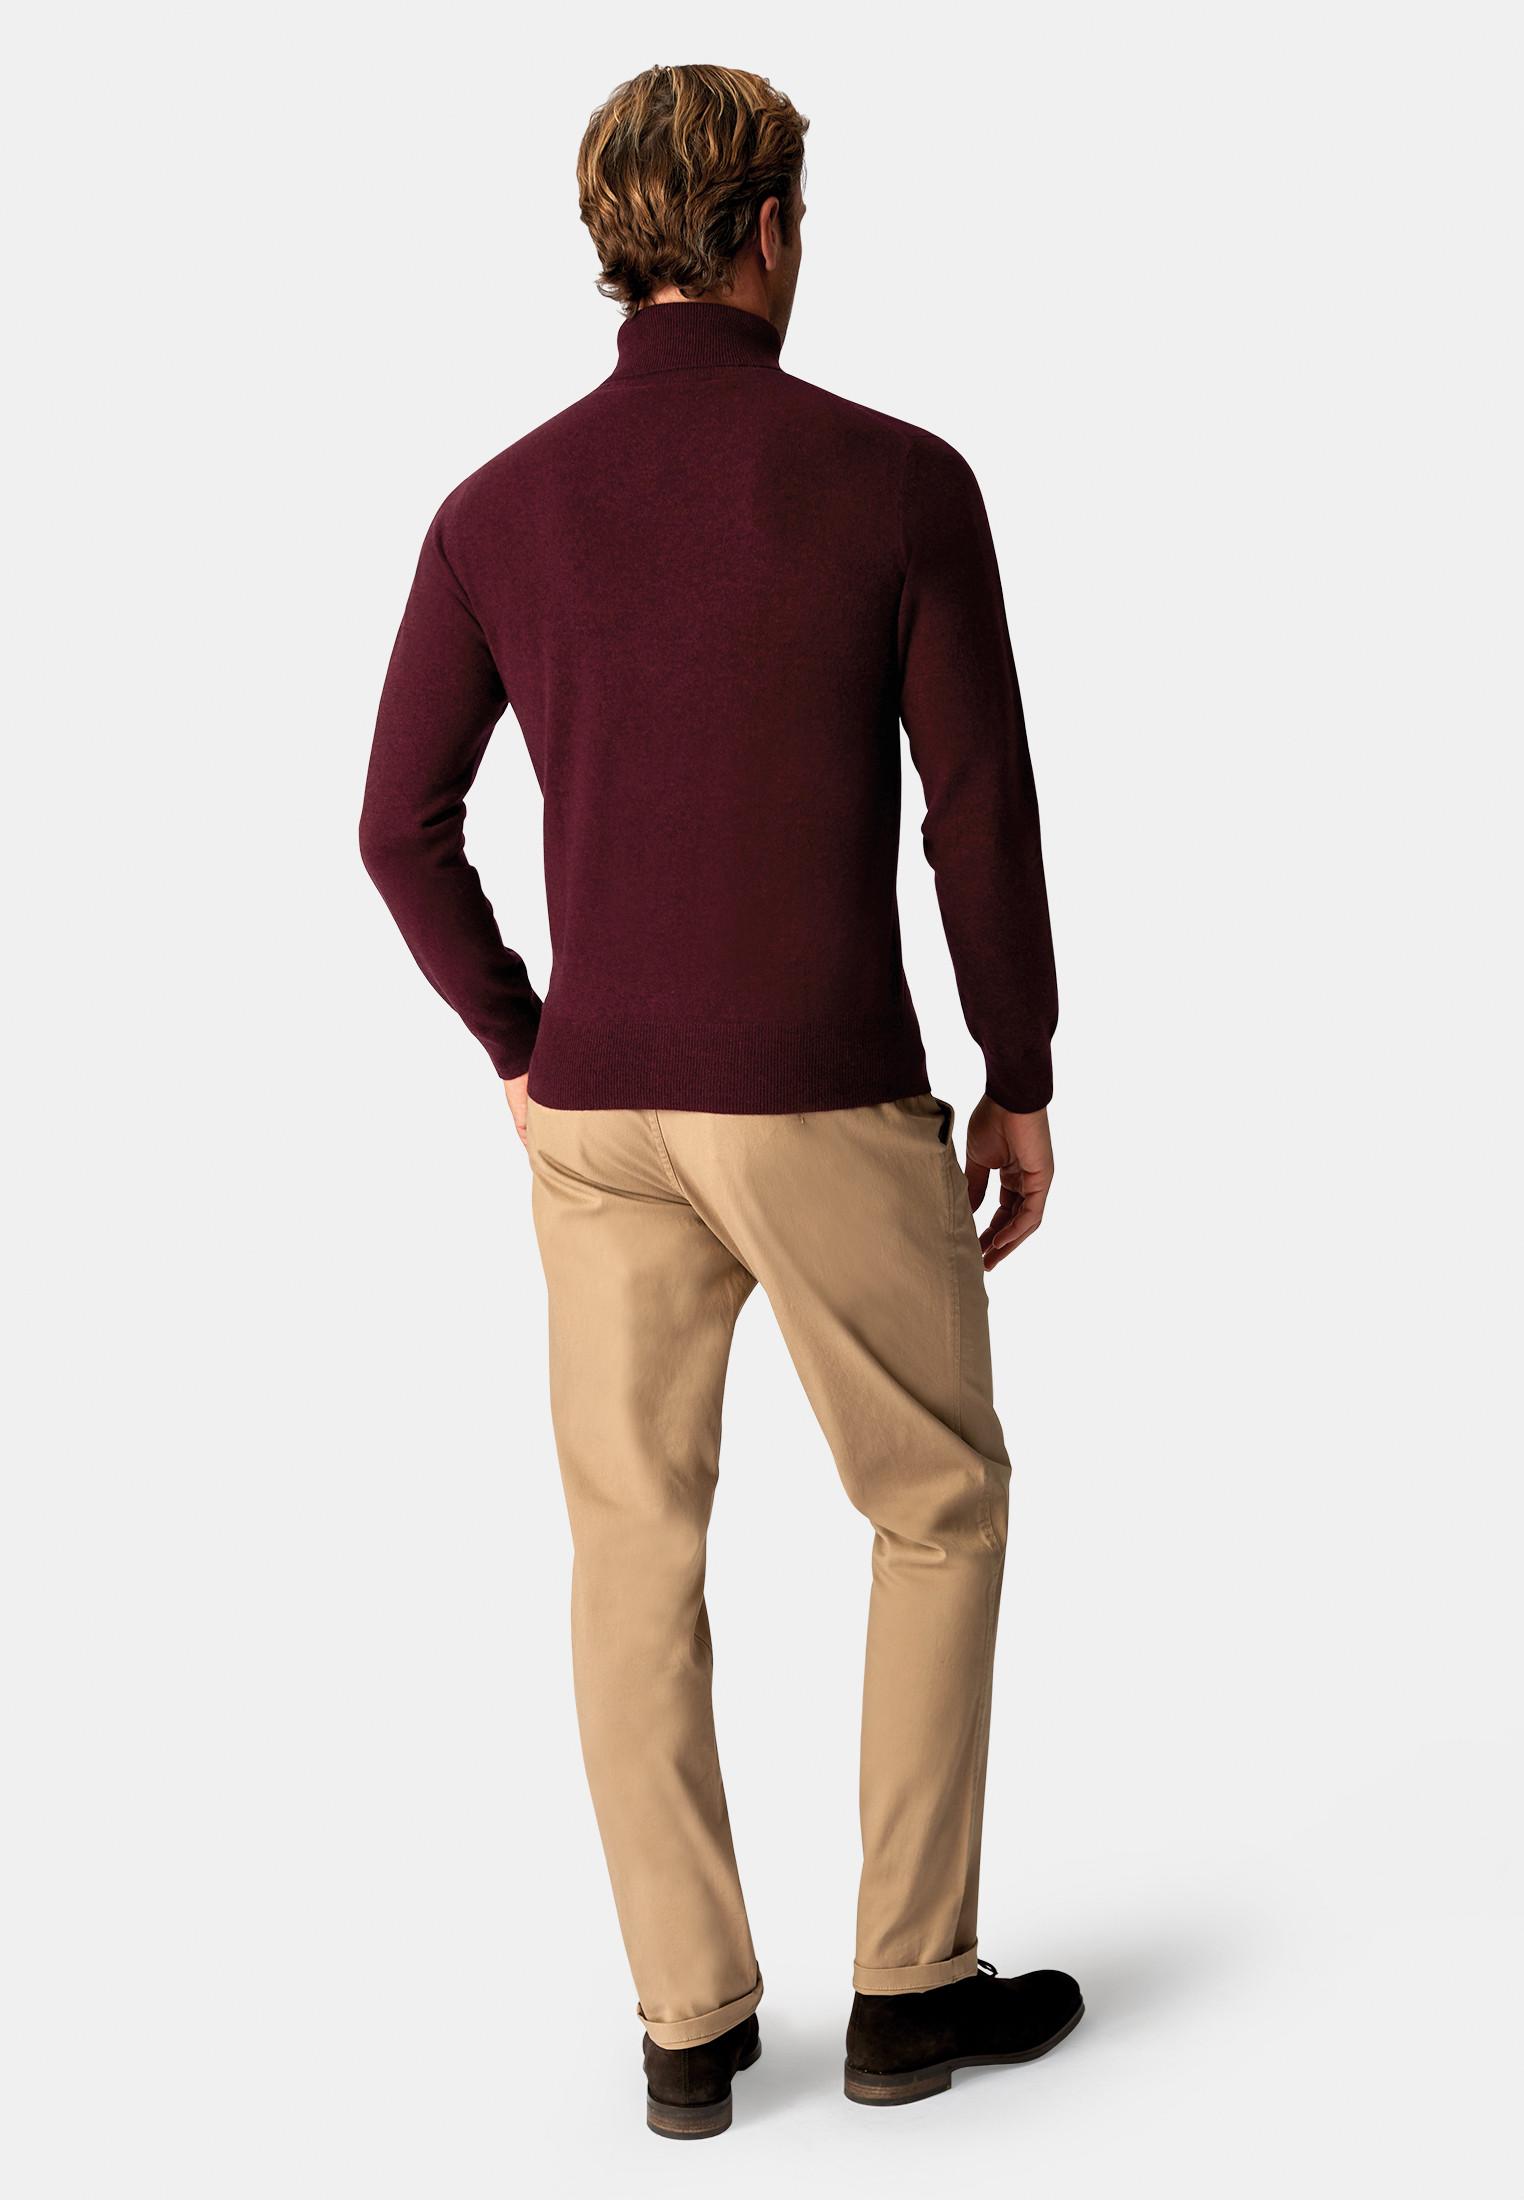 Shiraz Cashmere 14 Gauge Roll Neck Jumper